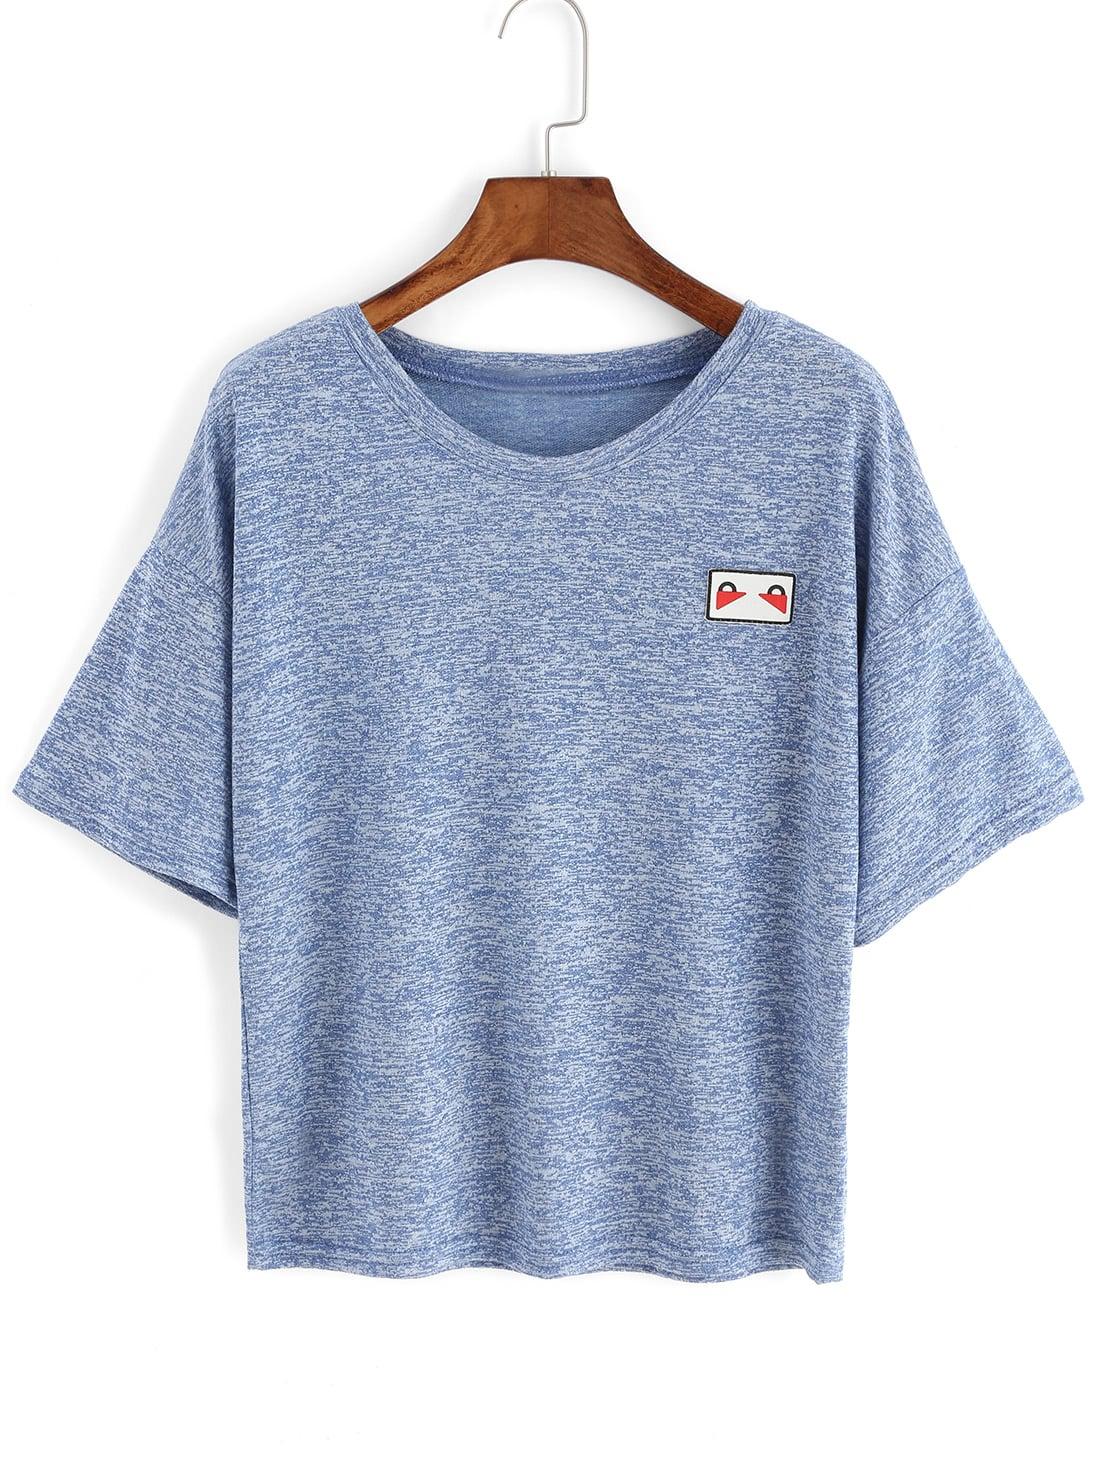 Heather Blue Patch T-shirt heather blue slogan print t shirt